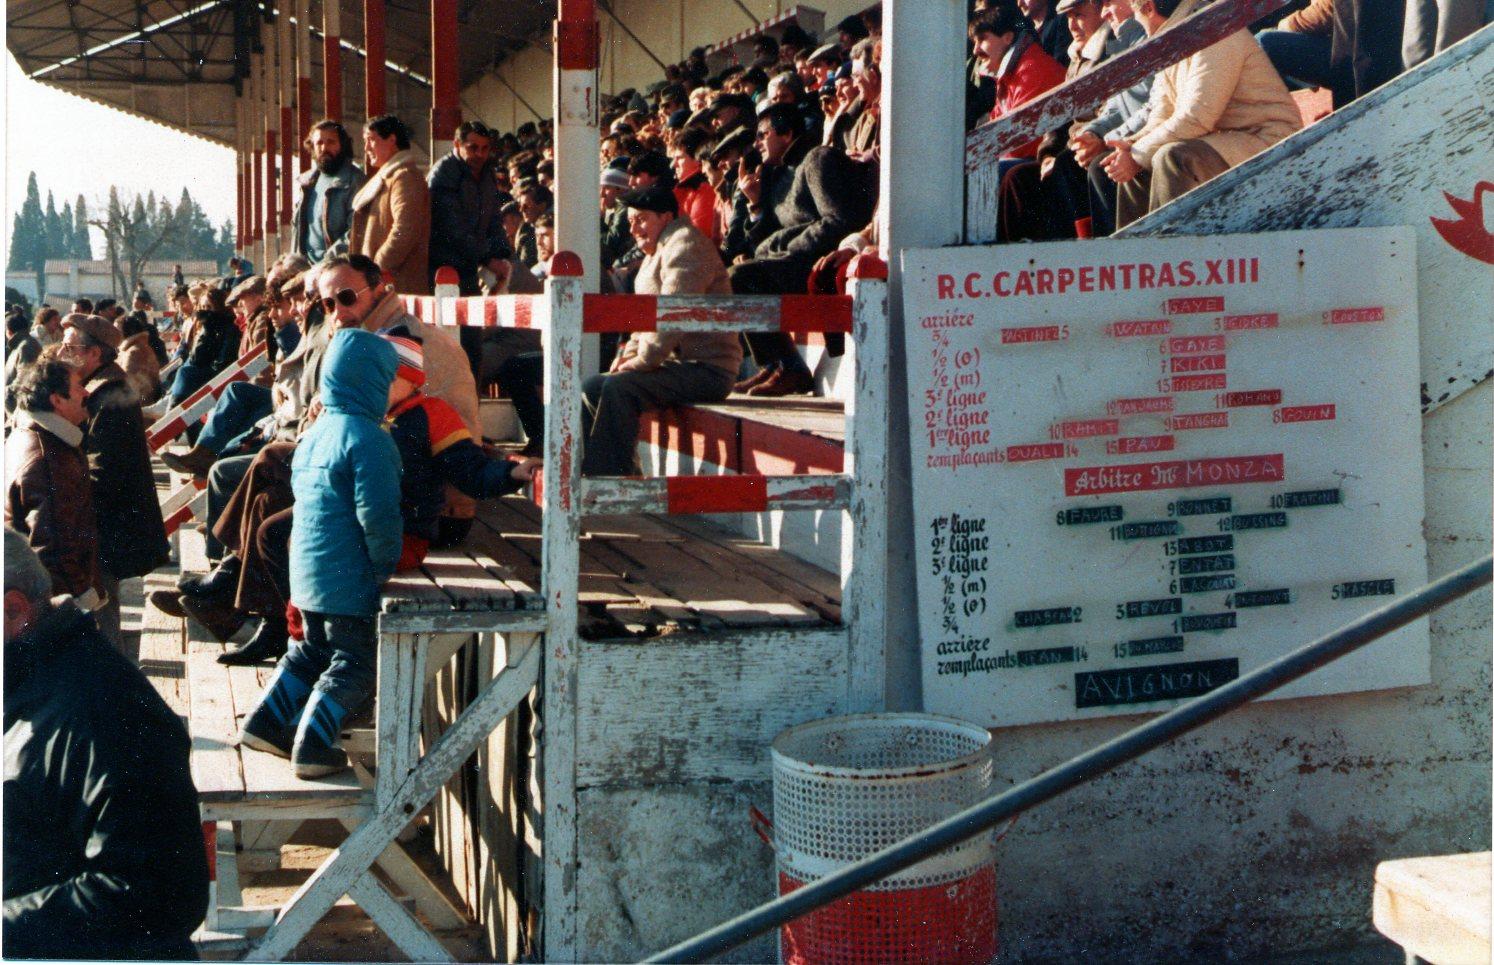 Stade de la Roseraie